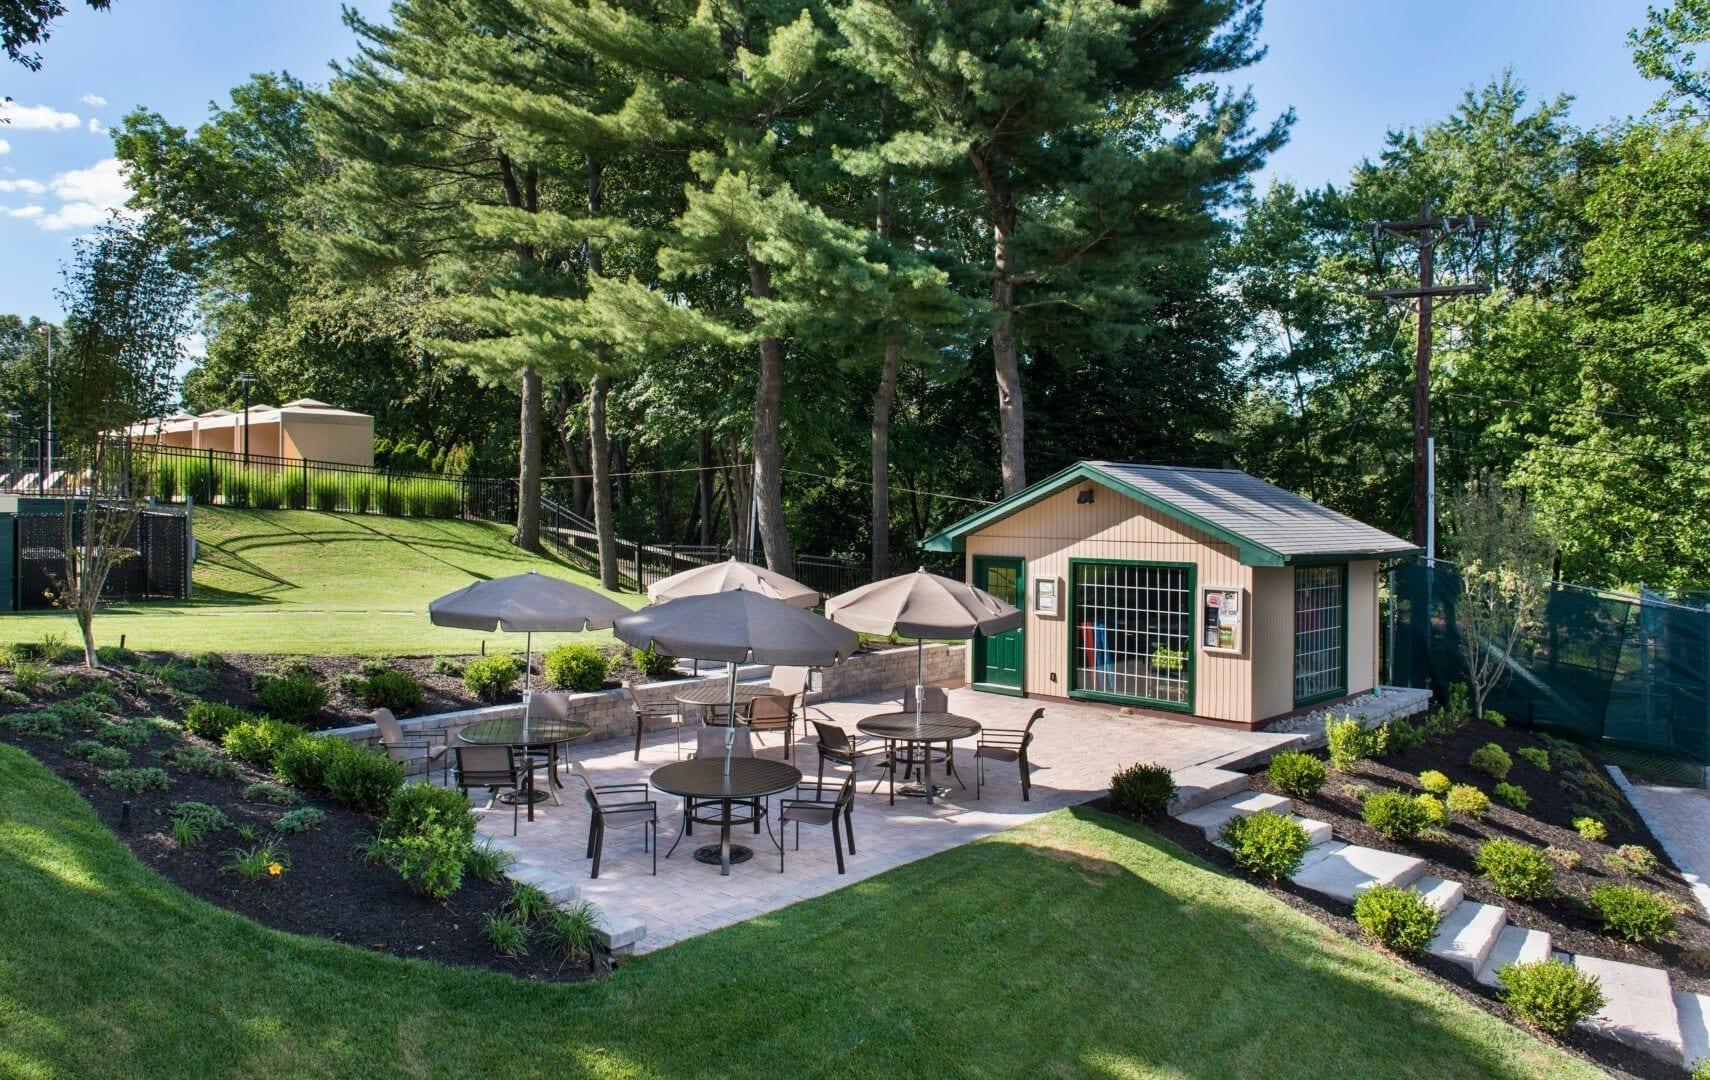 Edgewood Country Club Family Resort